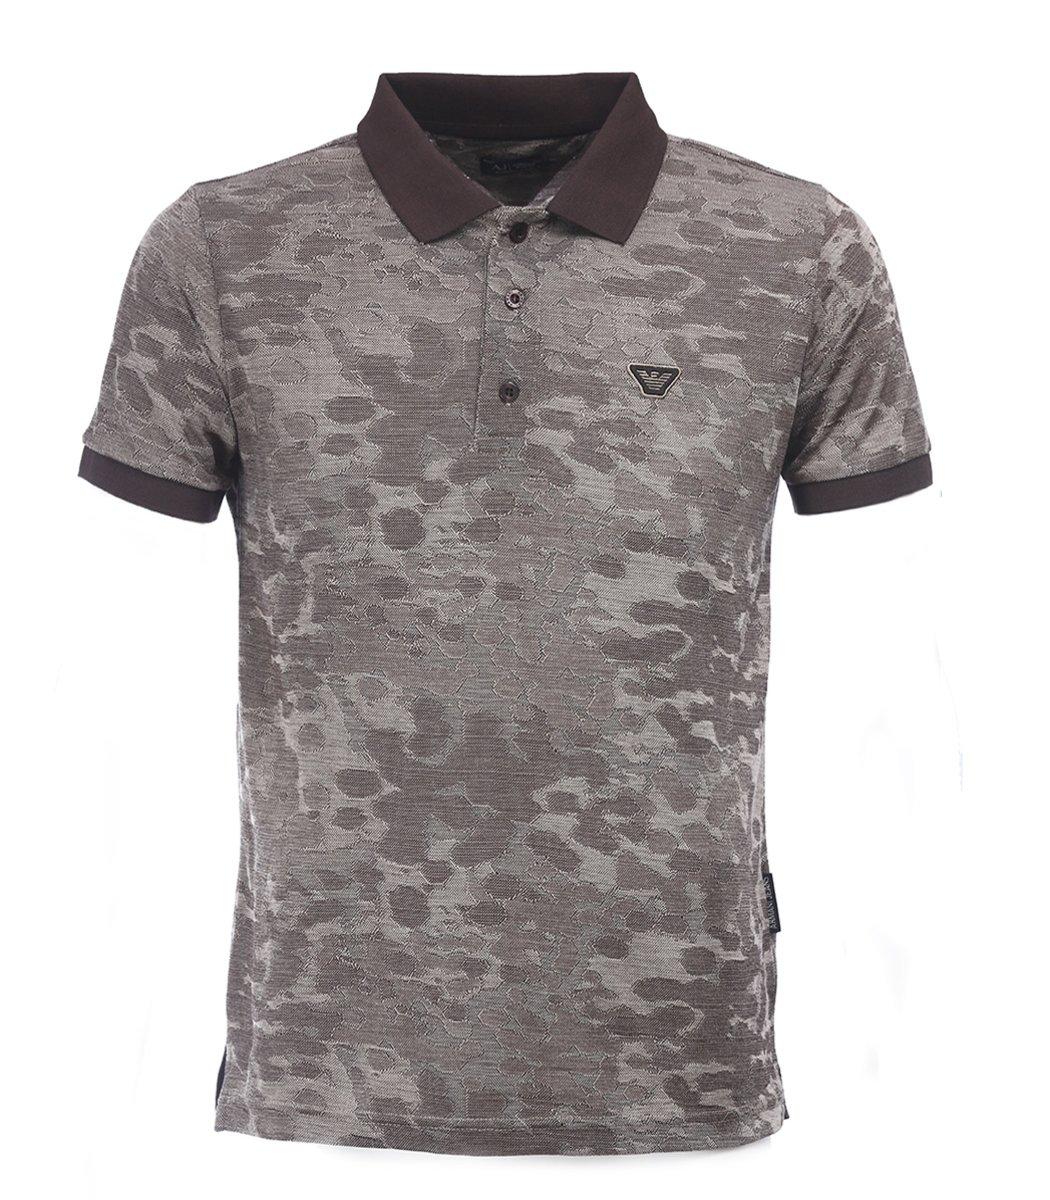 Коричневая футболка поло Giorgio Armani A1 - Коричневый - Вид 1